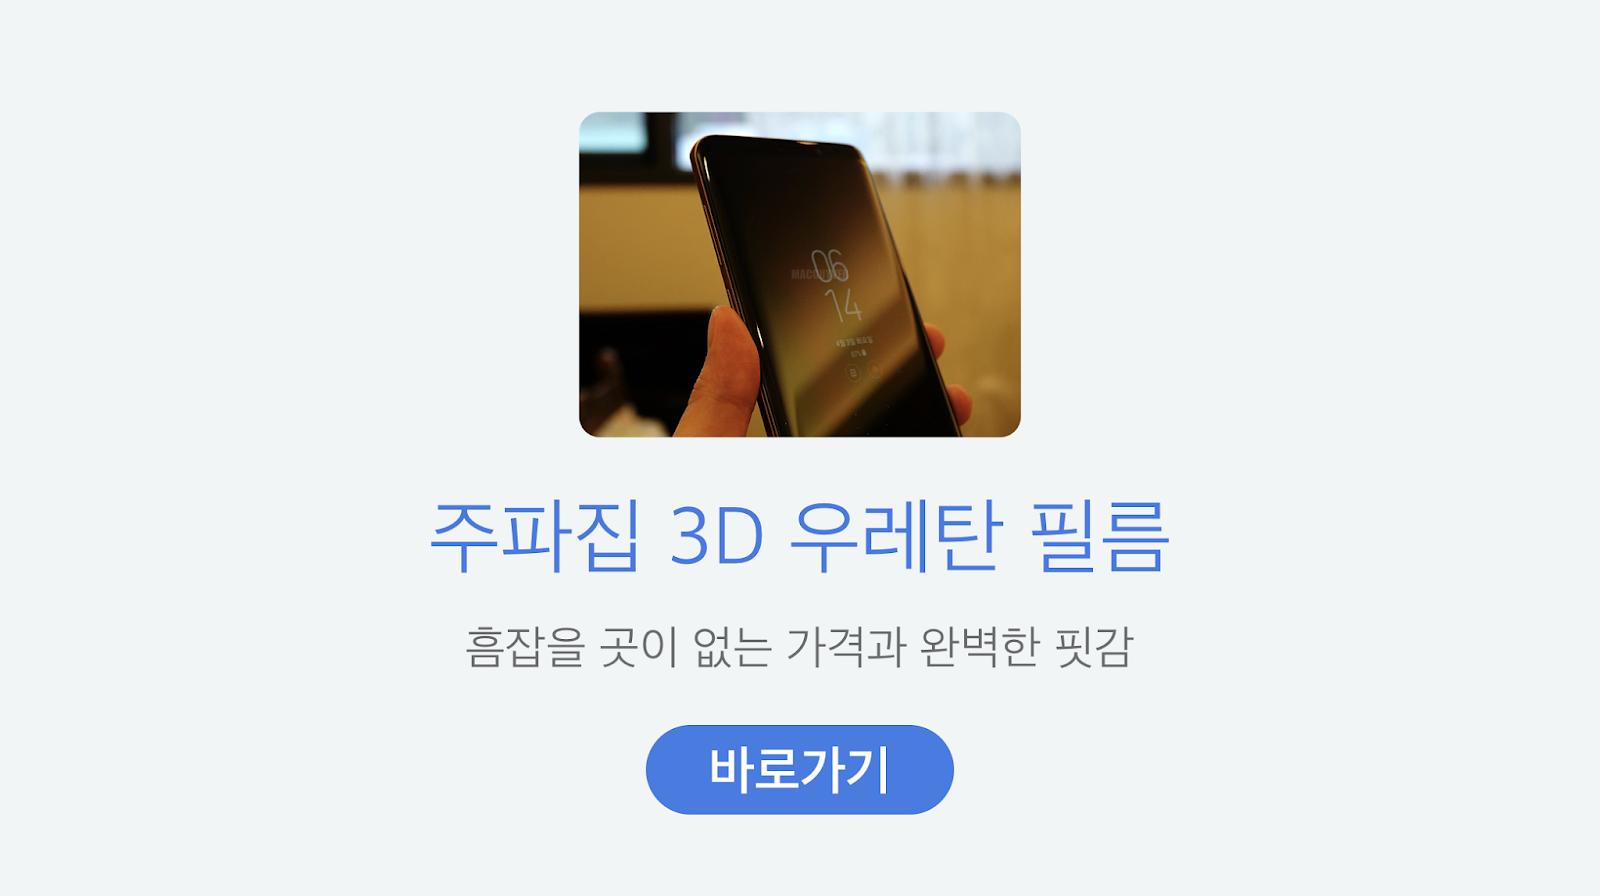 http://smartstore.naver.com/jupazip/products/2553427091